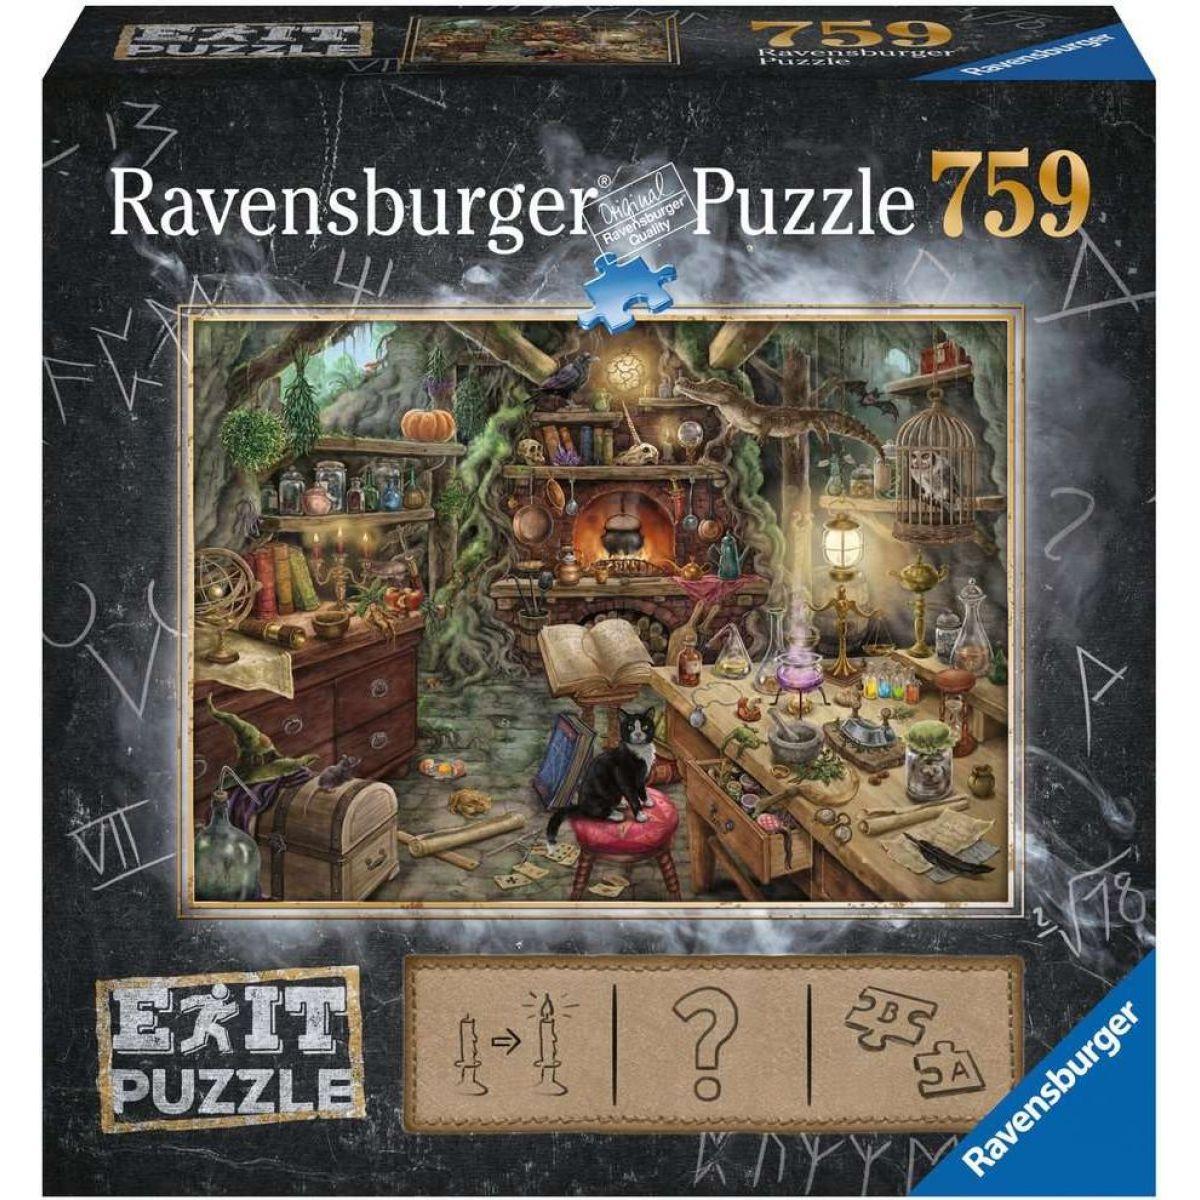 Ravensburger puzzle 199525 Exit Puzzle Čarodejnícka kuchyne 759 dielikov - Poškodený obal